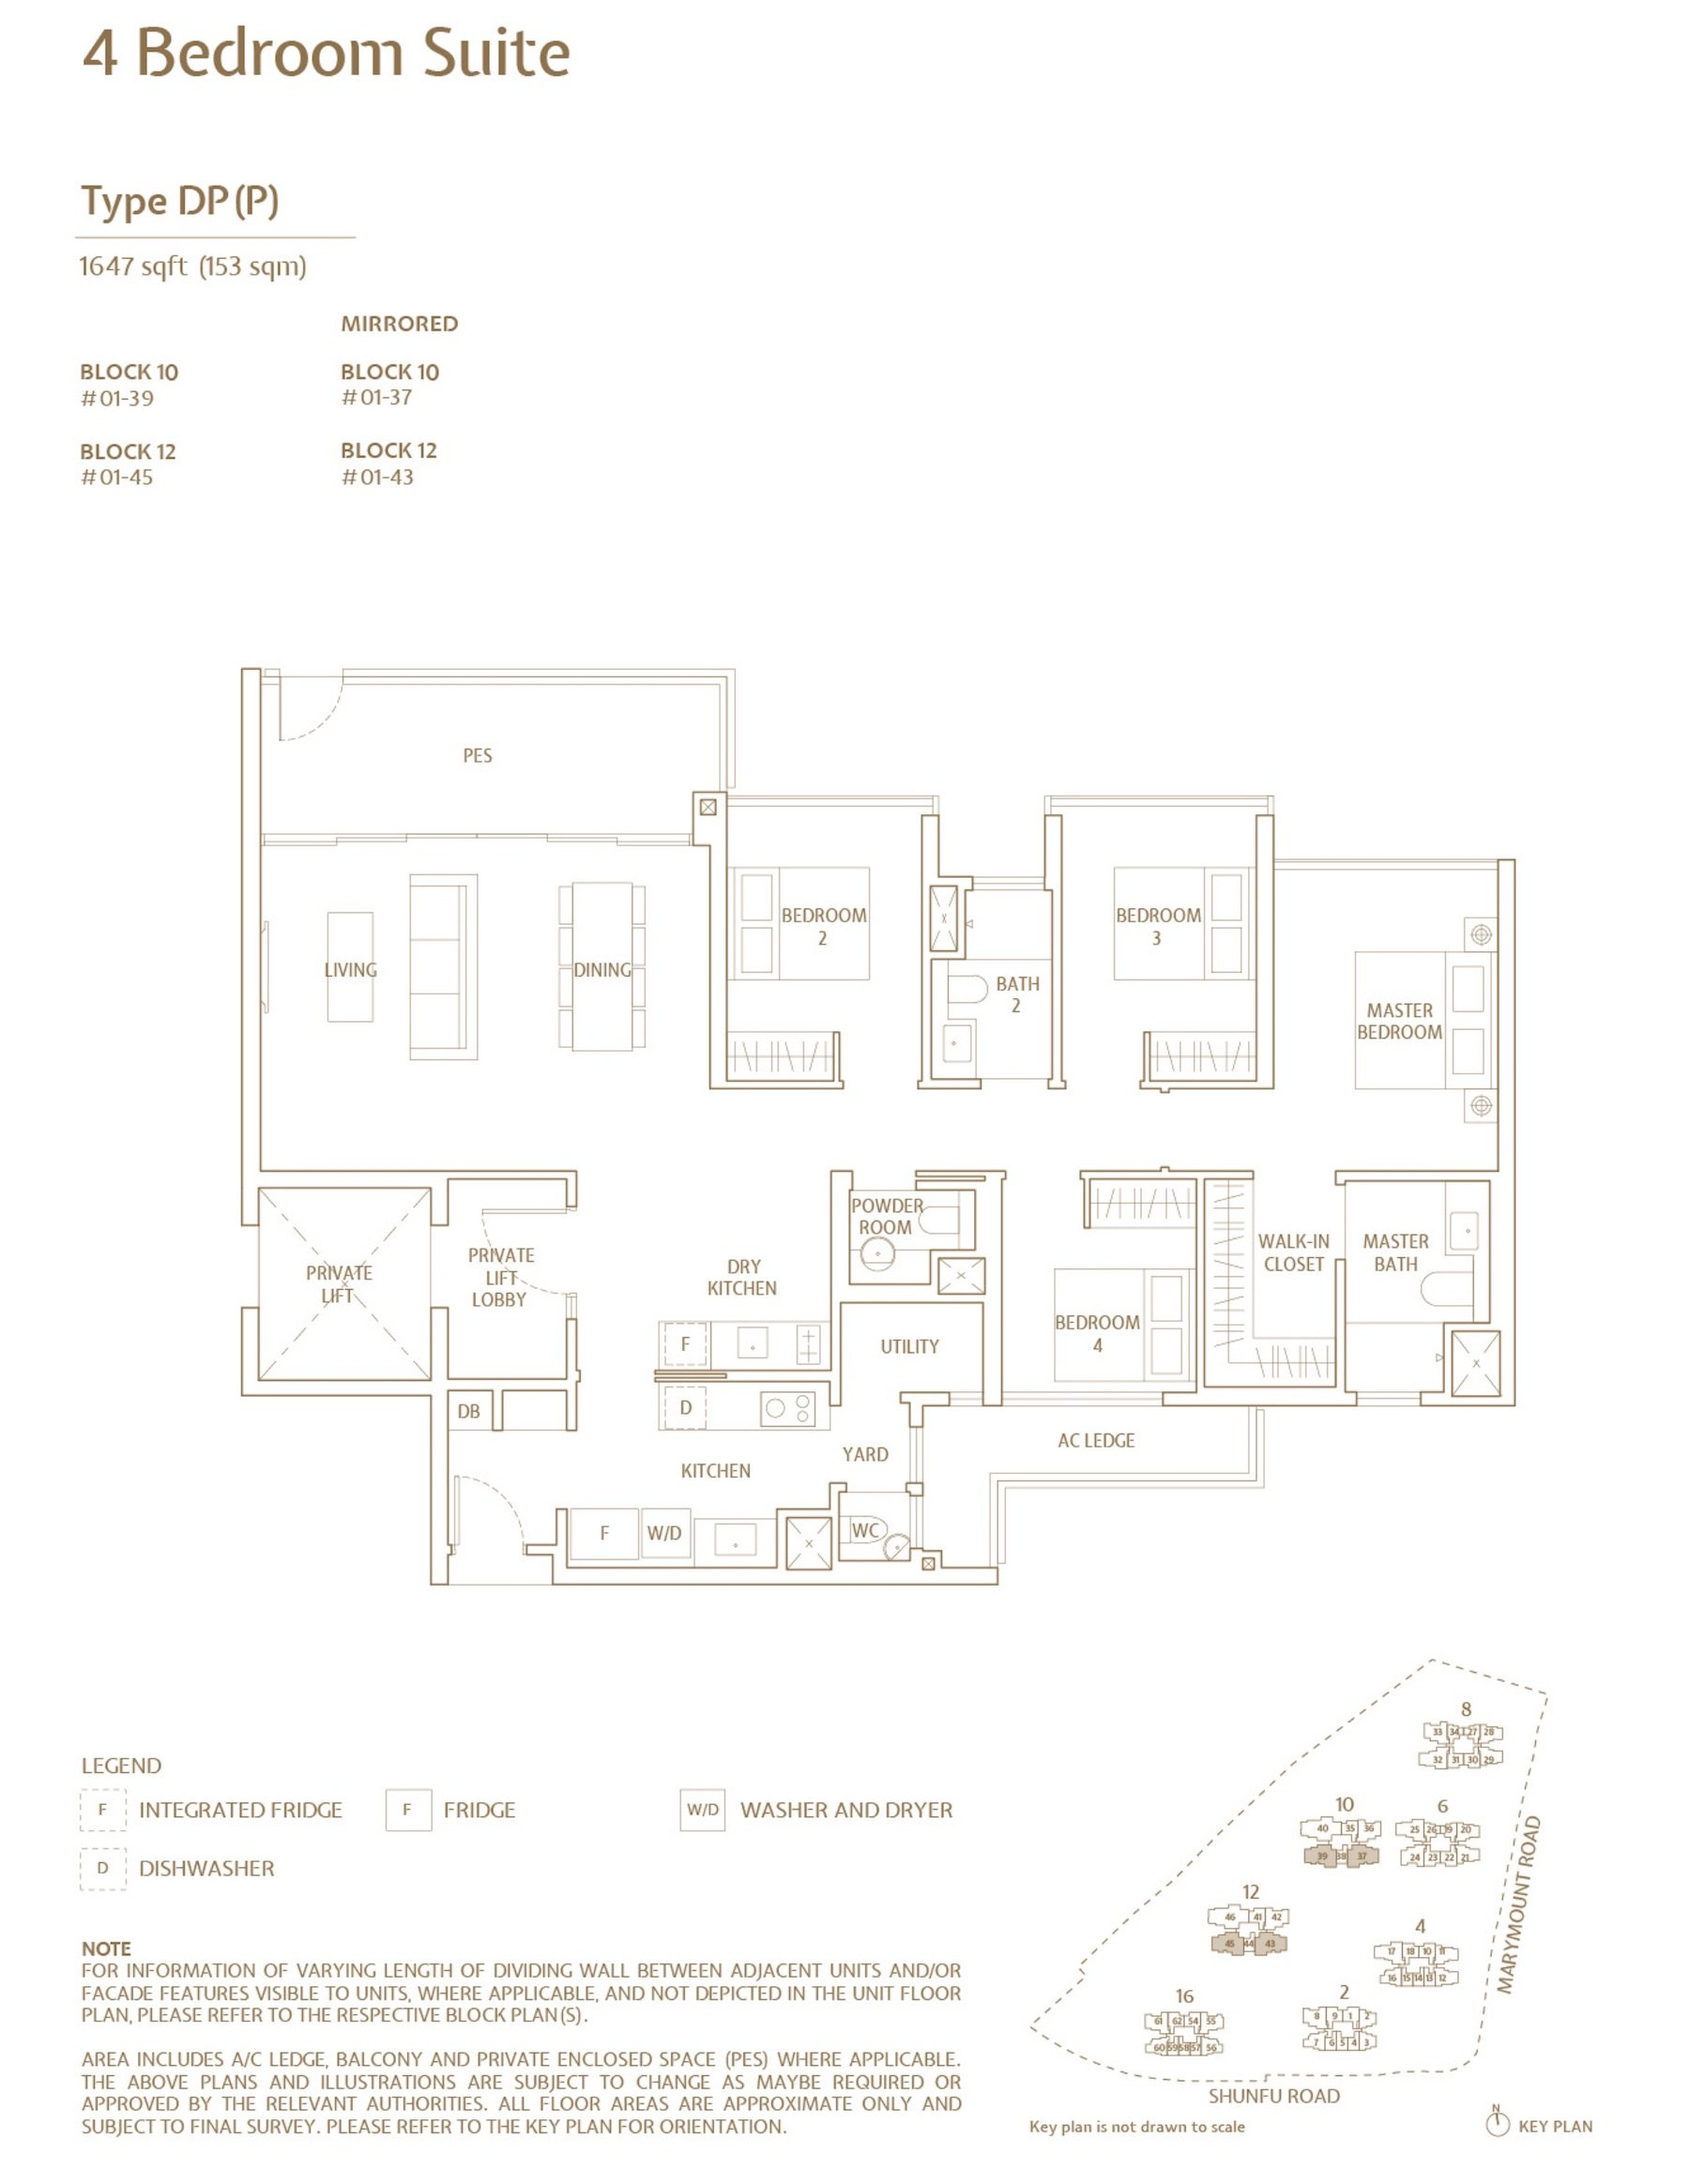 Jadescape 顺福轩 condo 4 bedroom type DP(P)